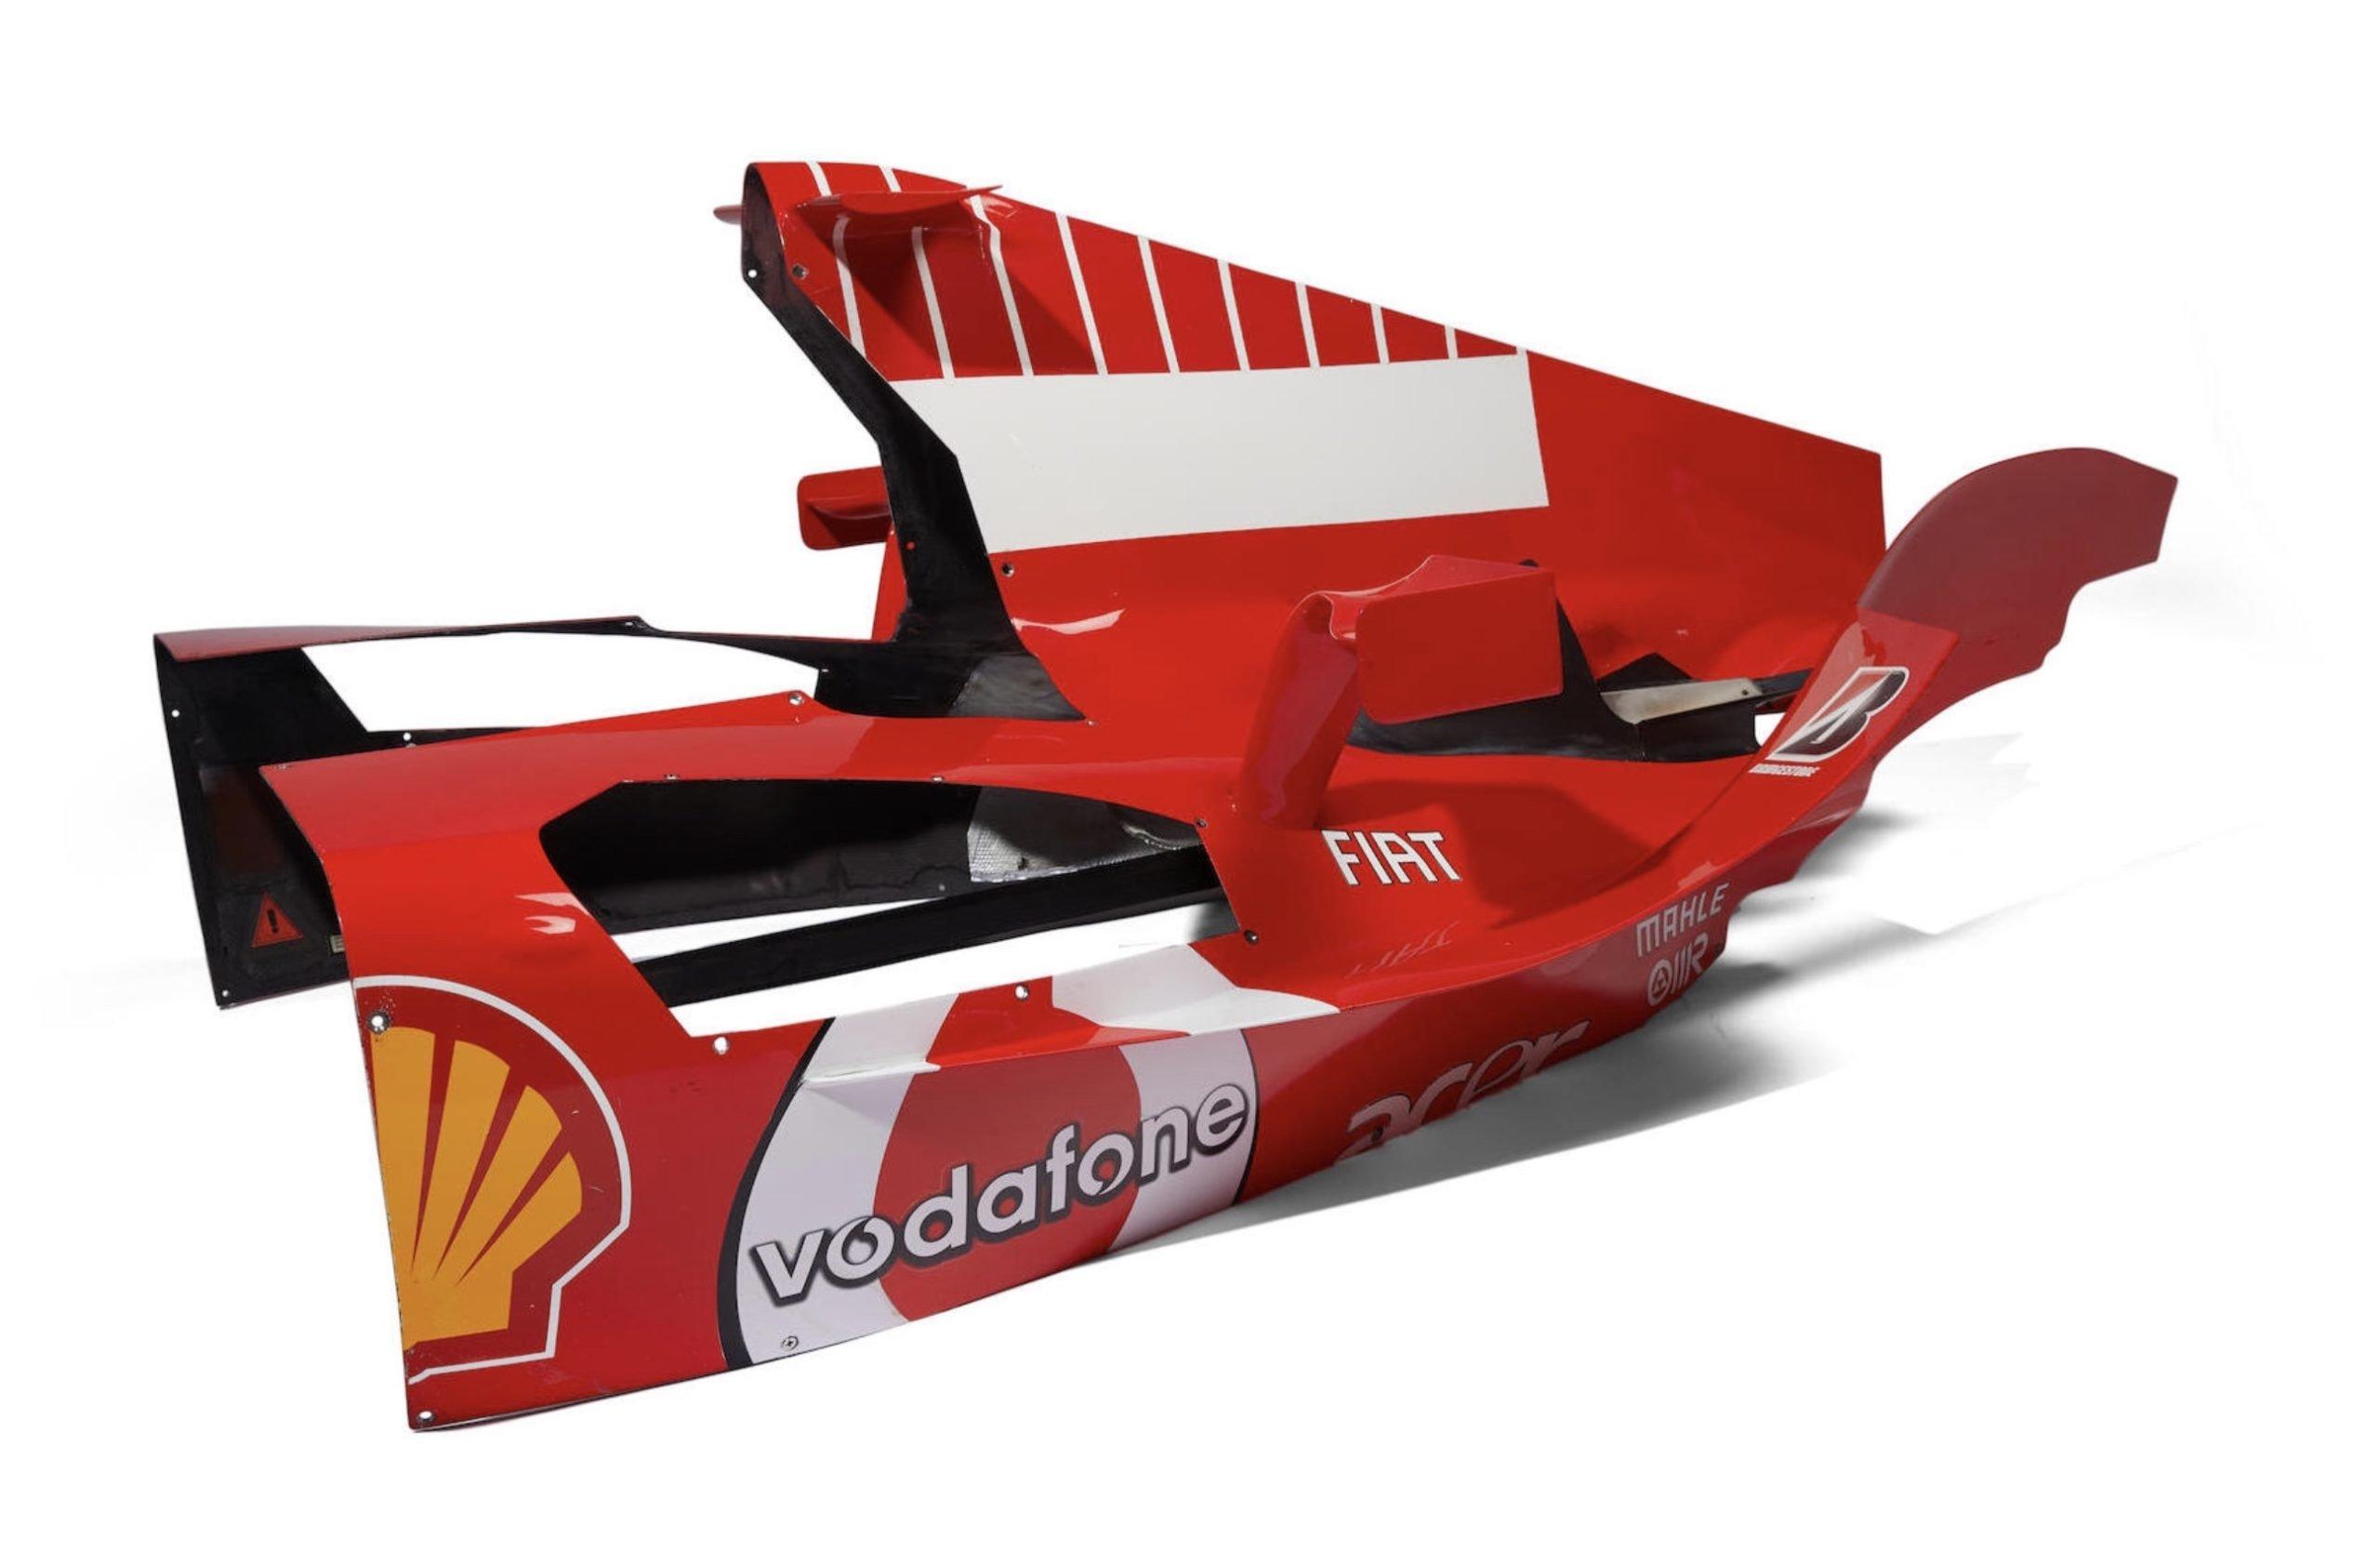 For Sale Michael Schumacher S Ferrari F2004 Engine Cover Est 1 500 And 2 500 Usd